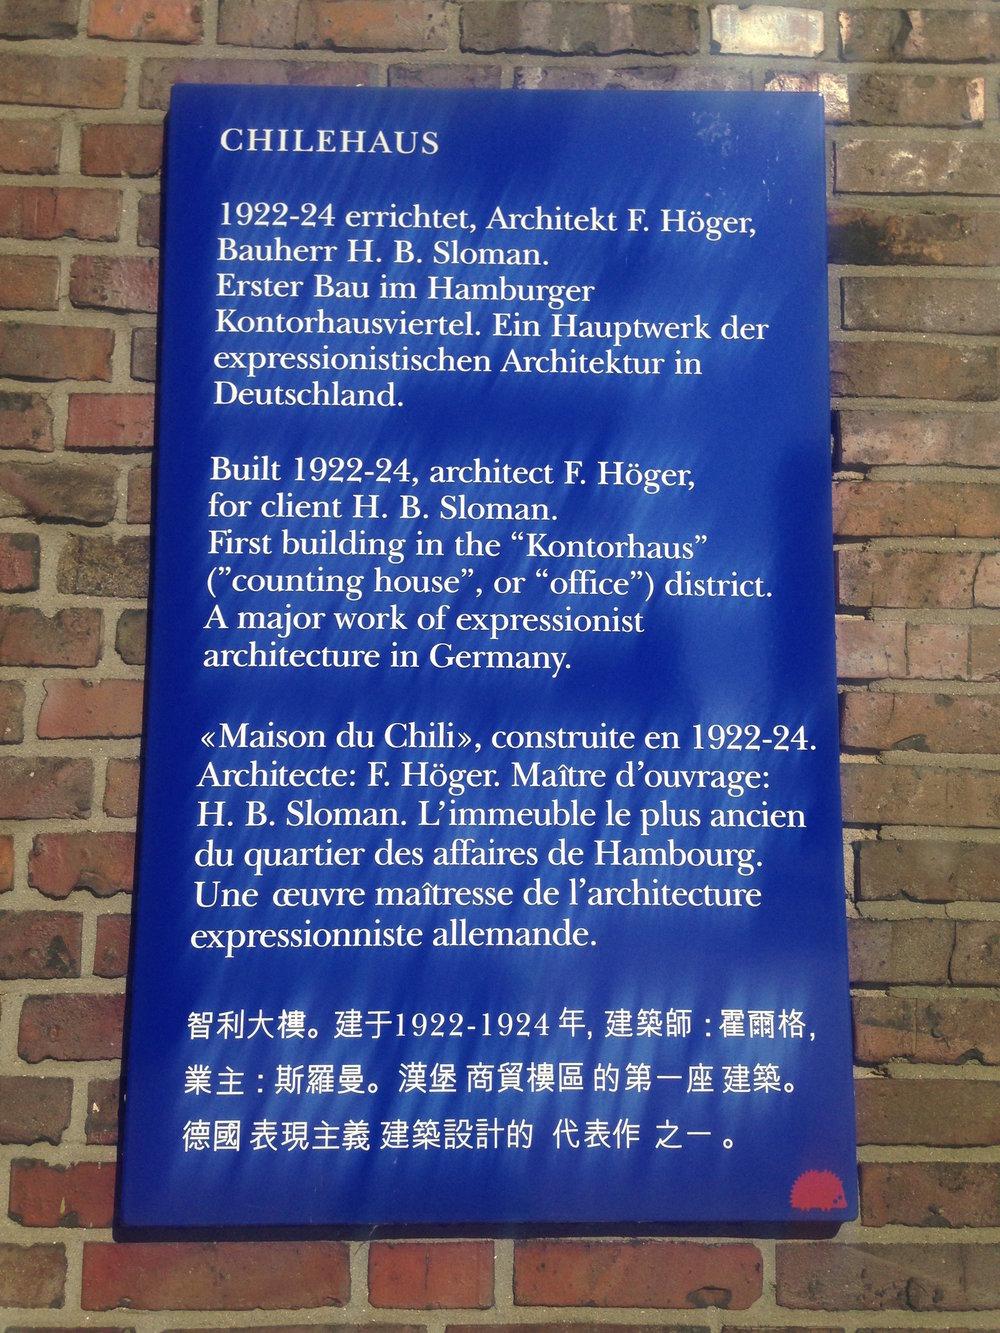 chilehaus-historic-information.jpg